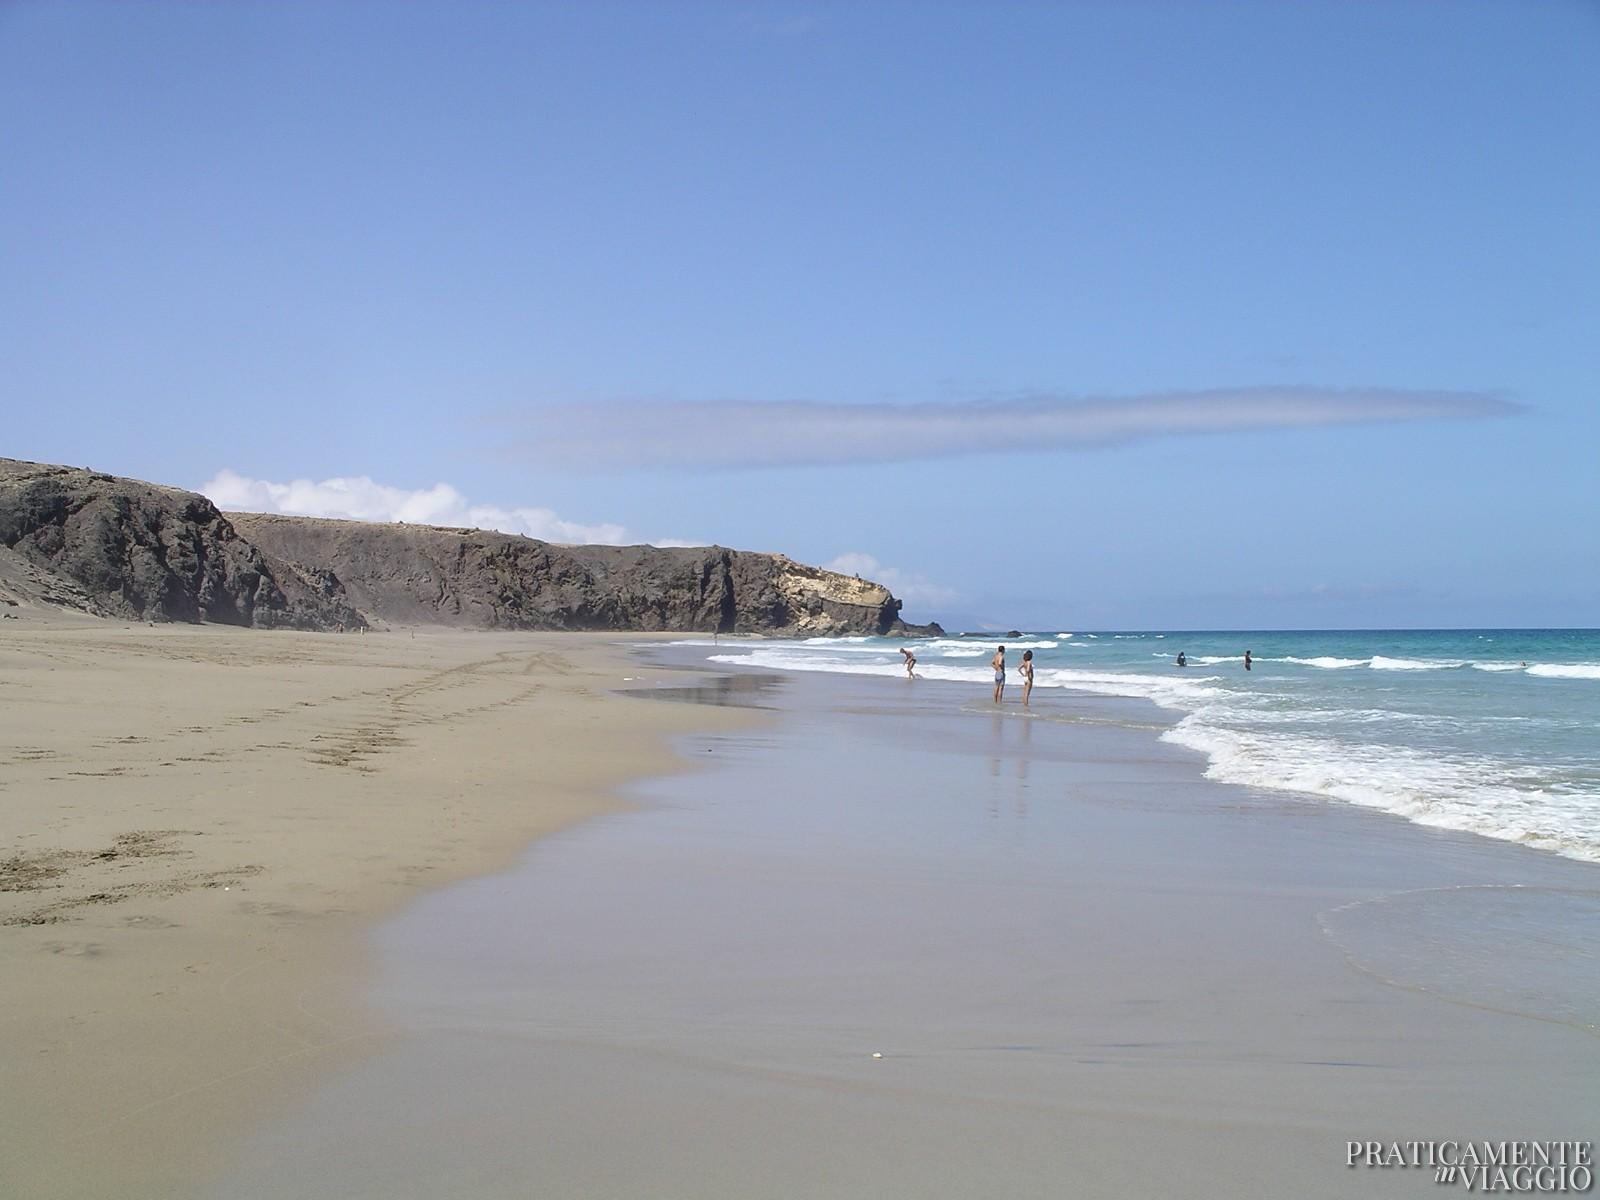 La pared spiagge fuerteventura